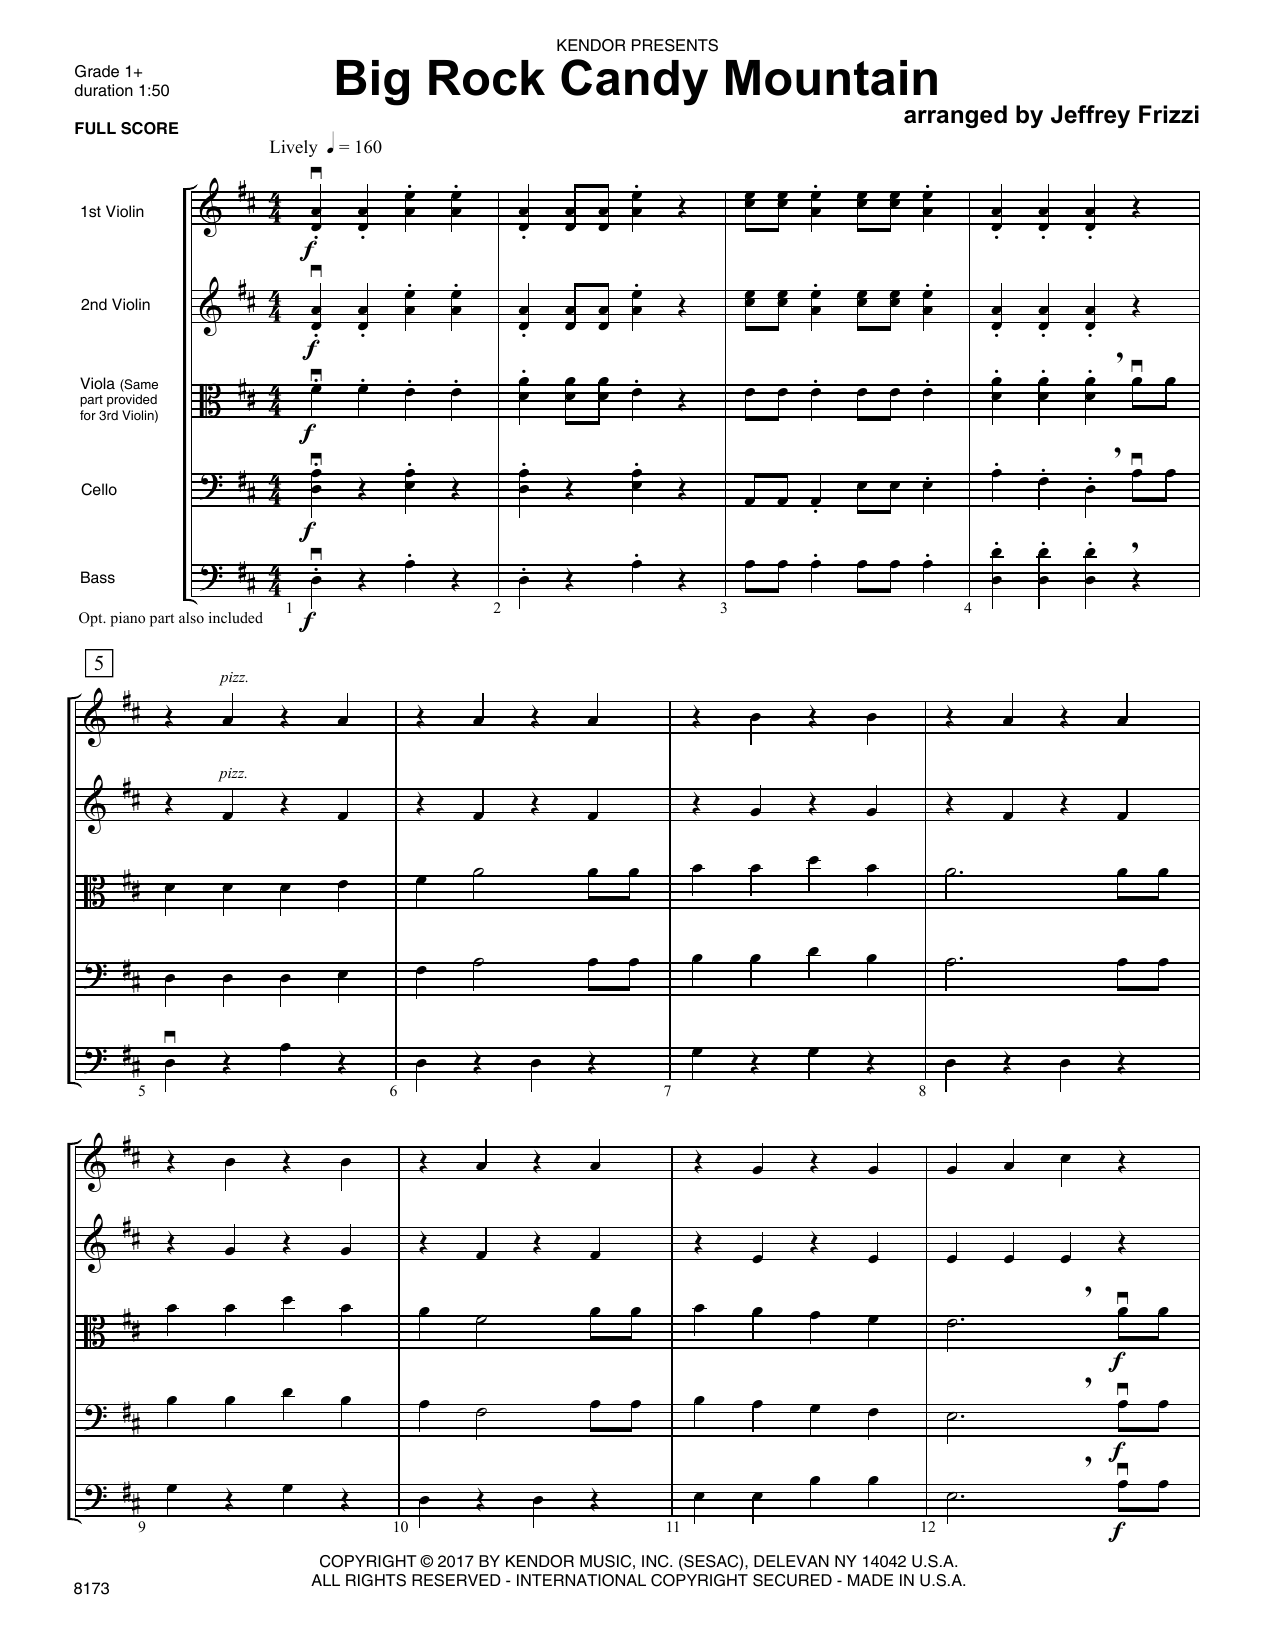 Jeffrey Frizzi Big Rock Candy Mountain   Full Score Sheet Music Notes,  Chords   Download Printable Orchestra PDF Score   SKU 15